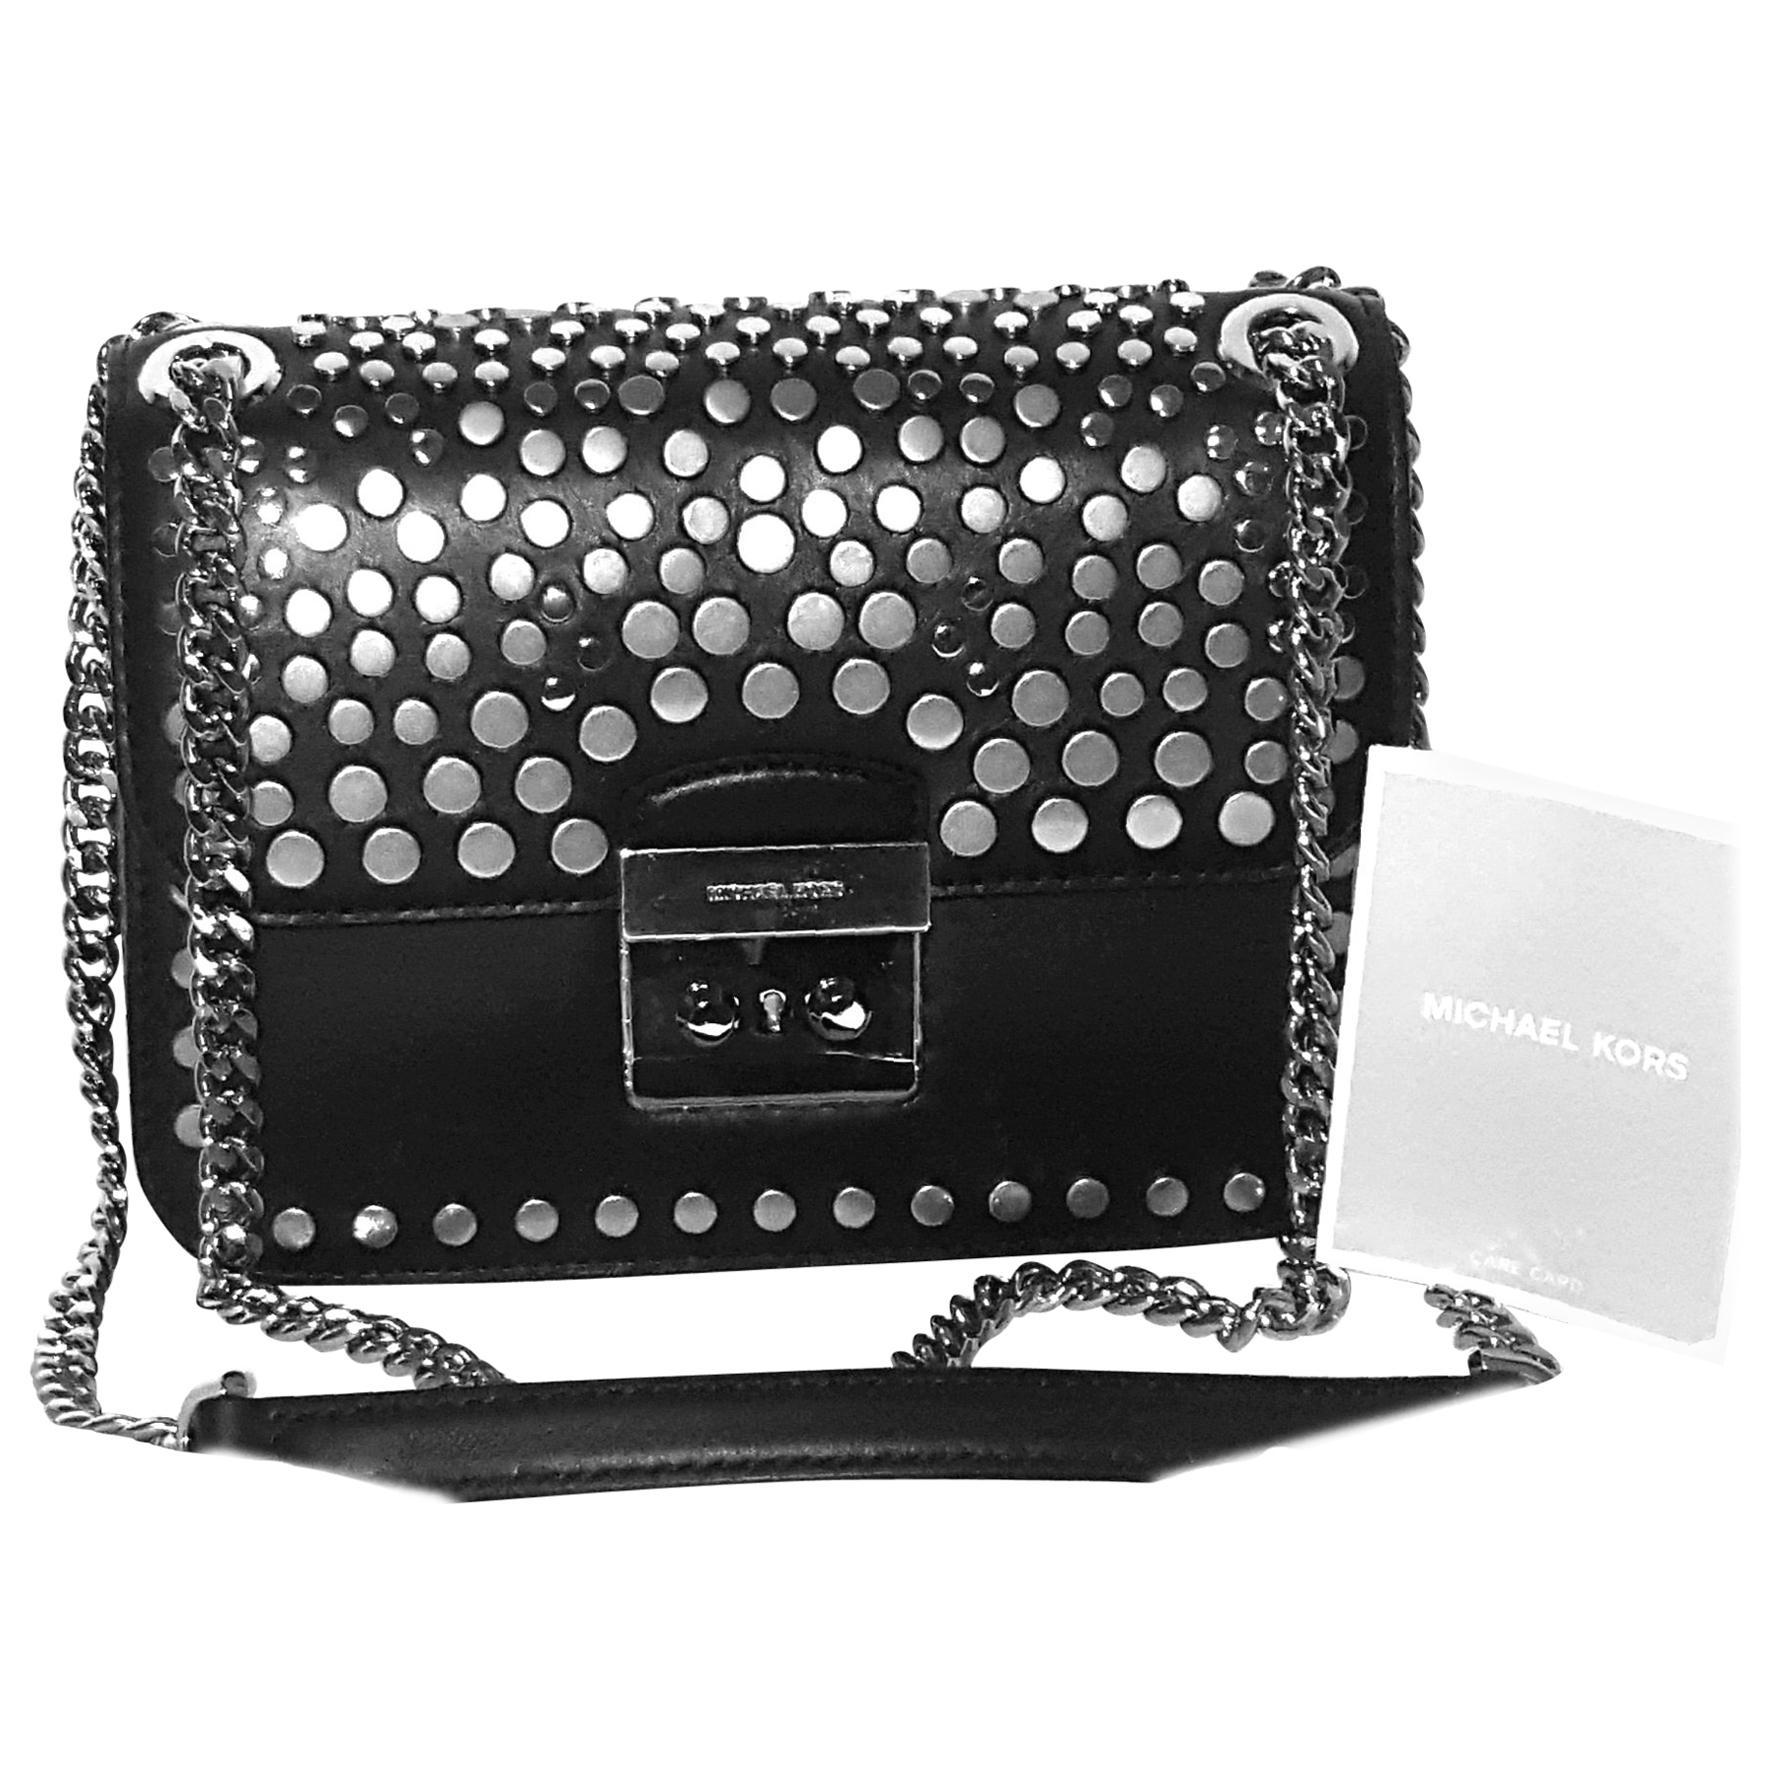 afa3de2a38de Michael Kors Jenkins Studded Black Leather Bag NEW W Tags at 1stdibs